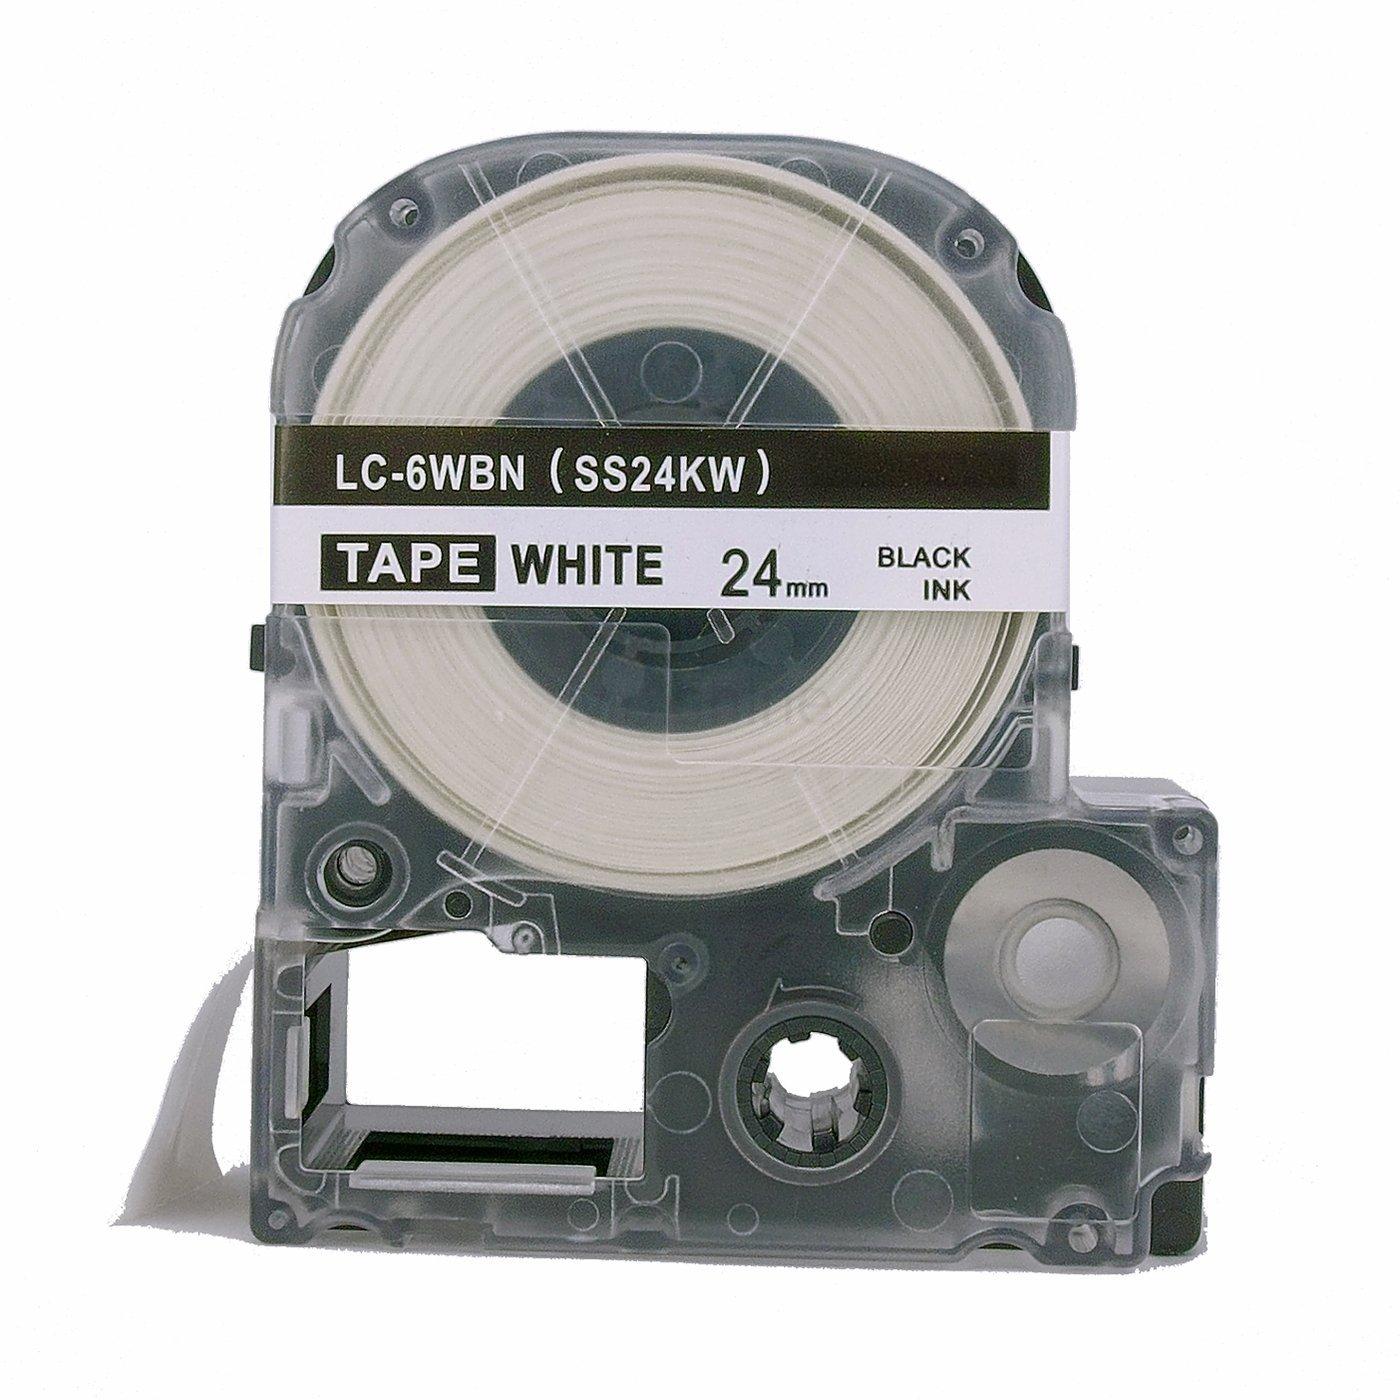 "molshine 1Pack LC-6WBN9LK-6WBN9 (ss24kw) Label Tape COMPATIBLES para Epson negro sobre blanco (1/1"" 24mm) 8m"